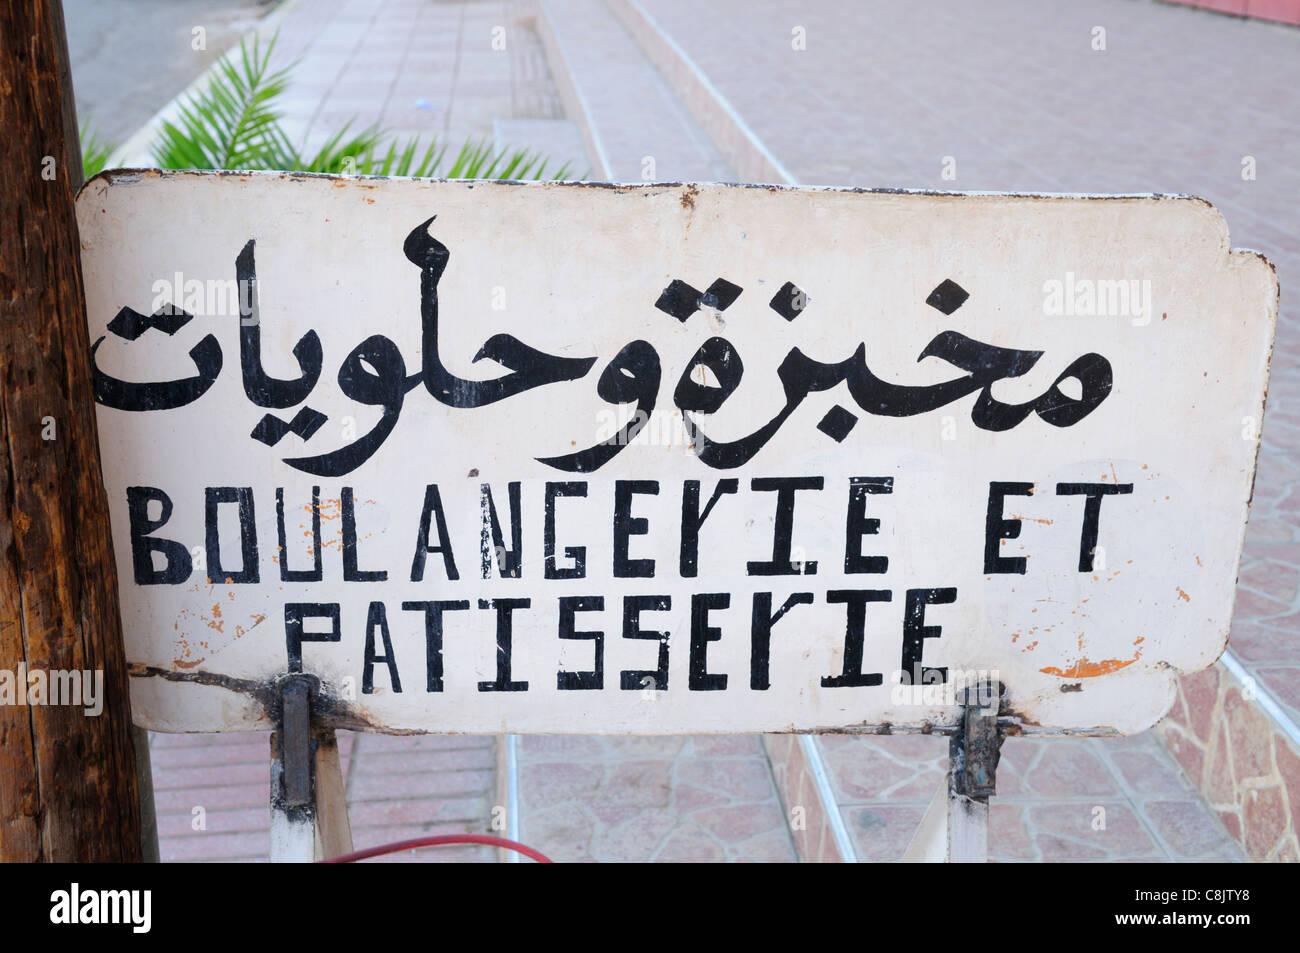 Bilingual Boulangerie et Patisserie sign, Tafraoute, Morocco - Stock Image